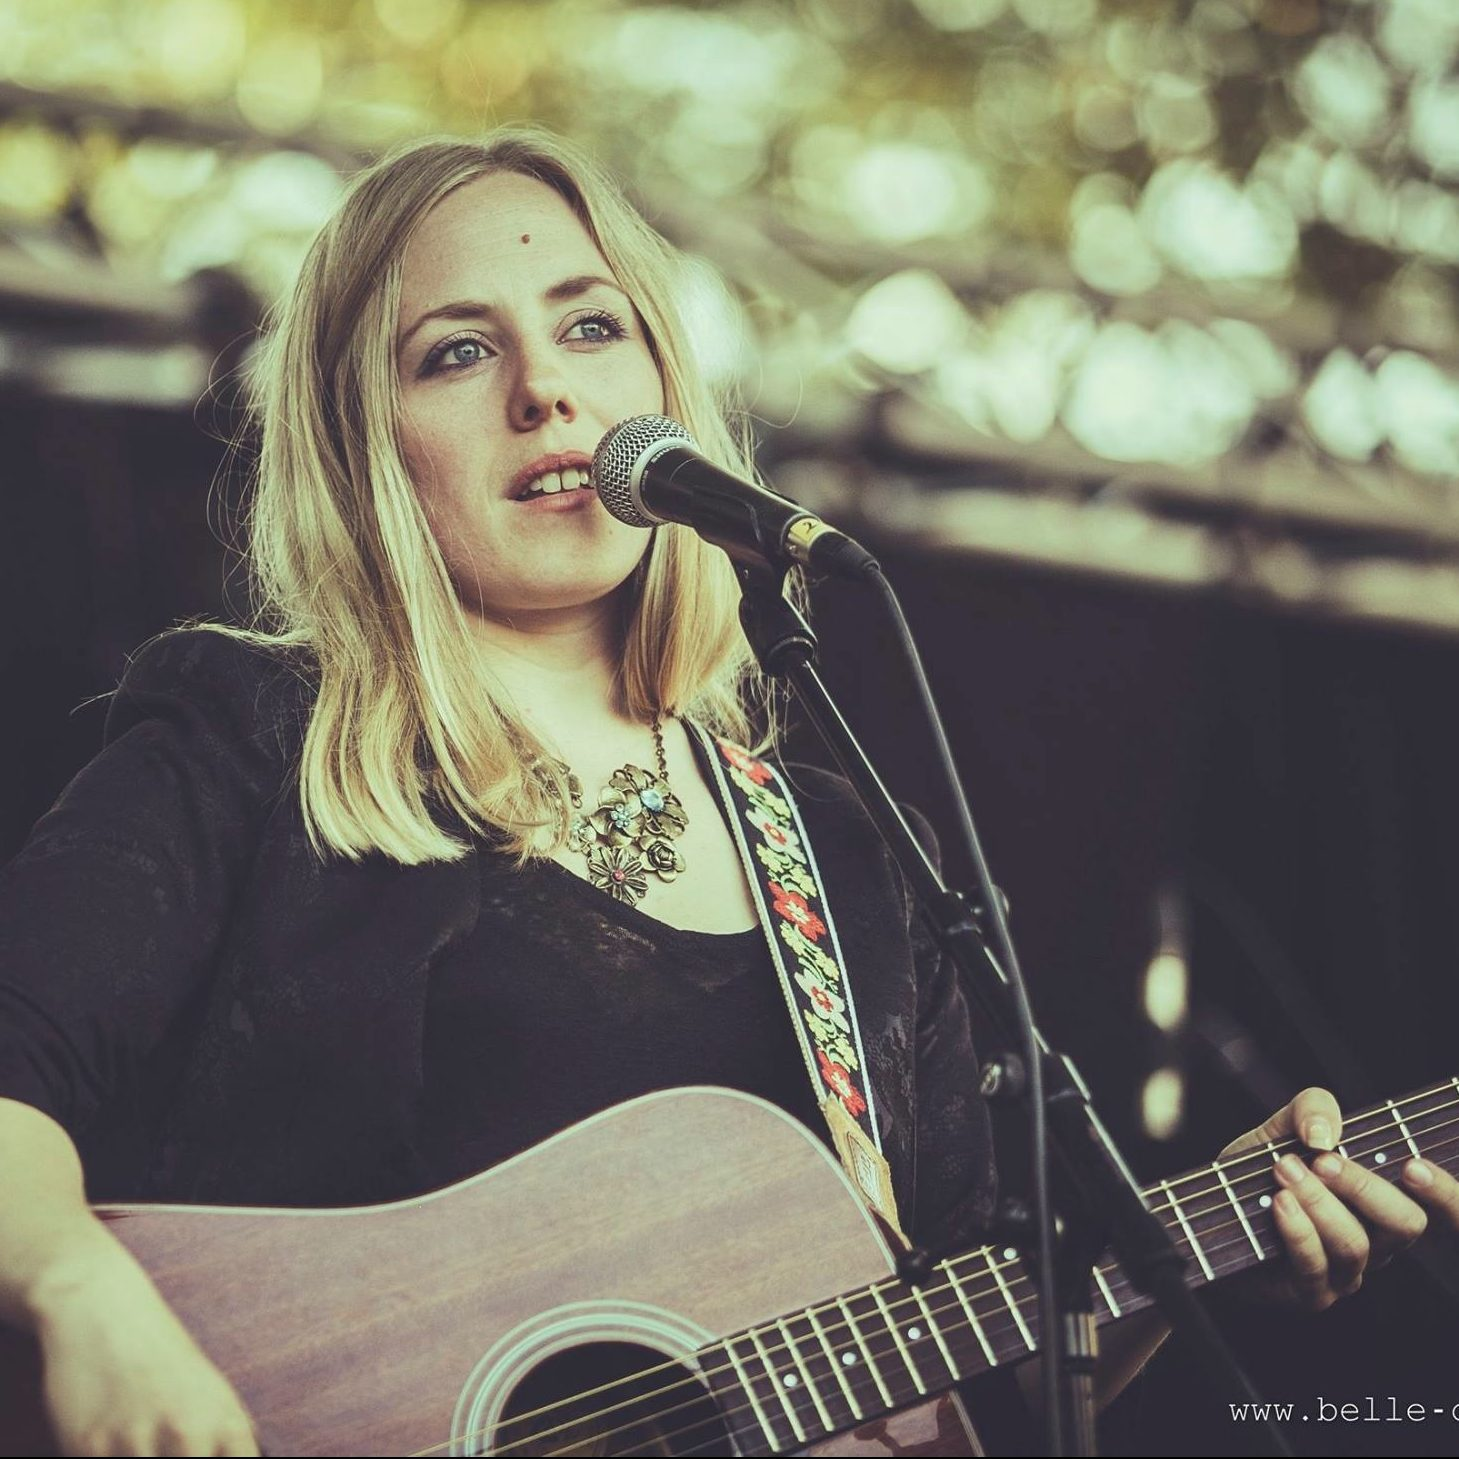 Festival Musicalarue. Luxey 2014. Photographe inconnu.